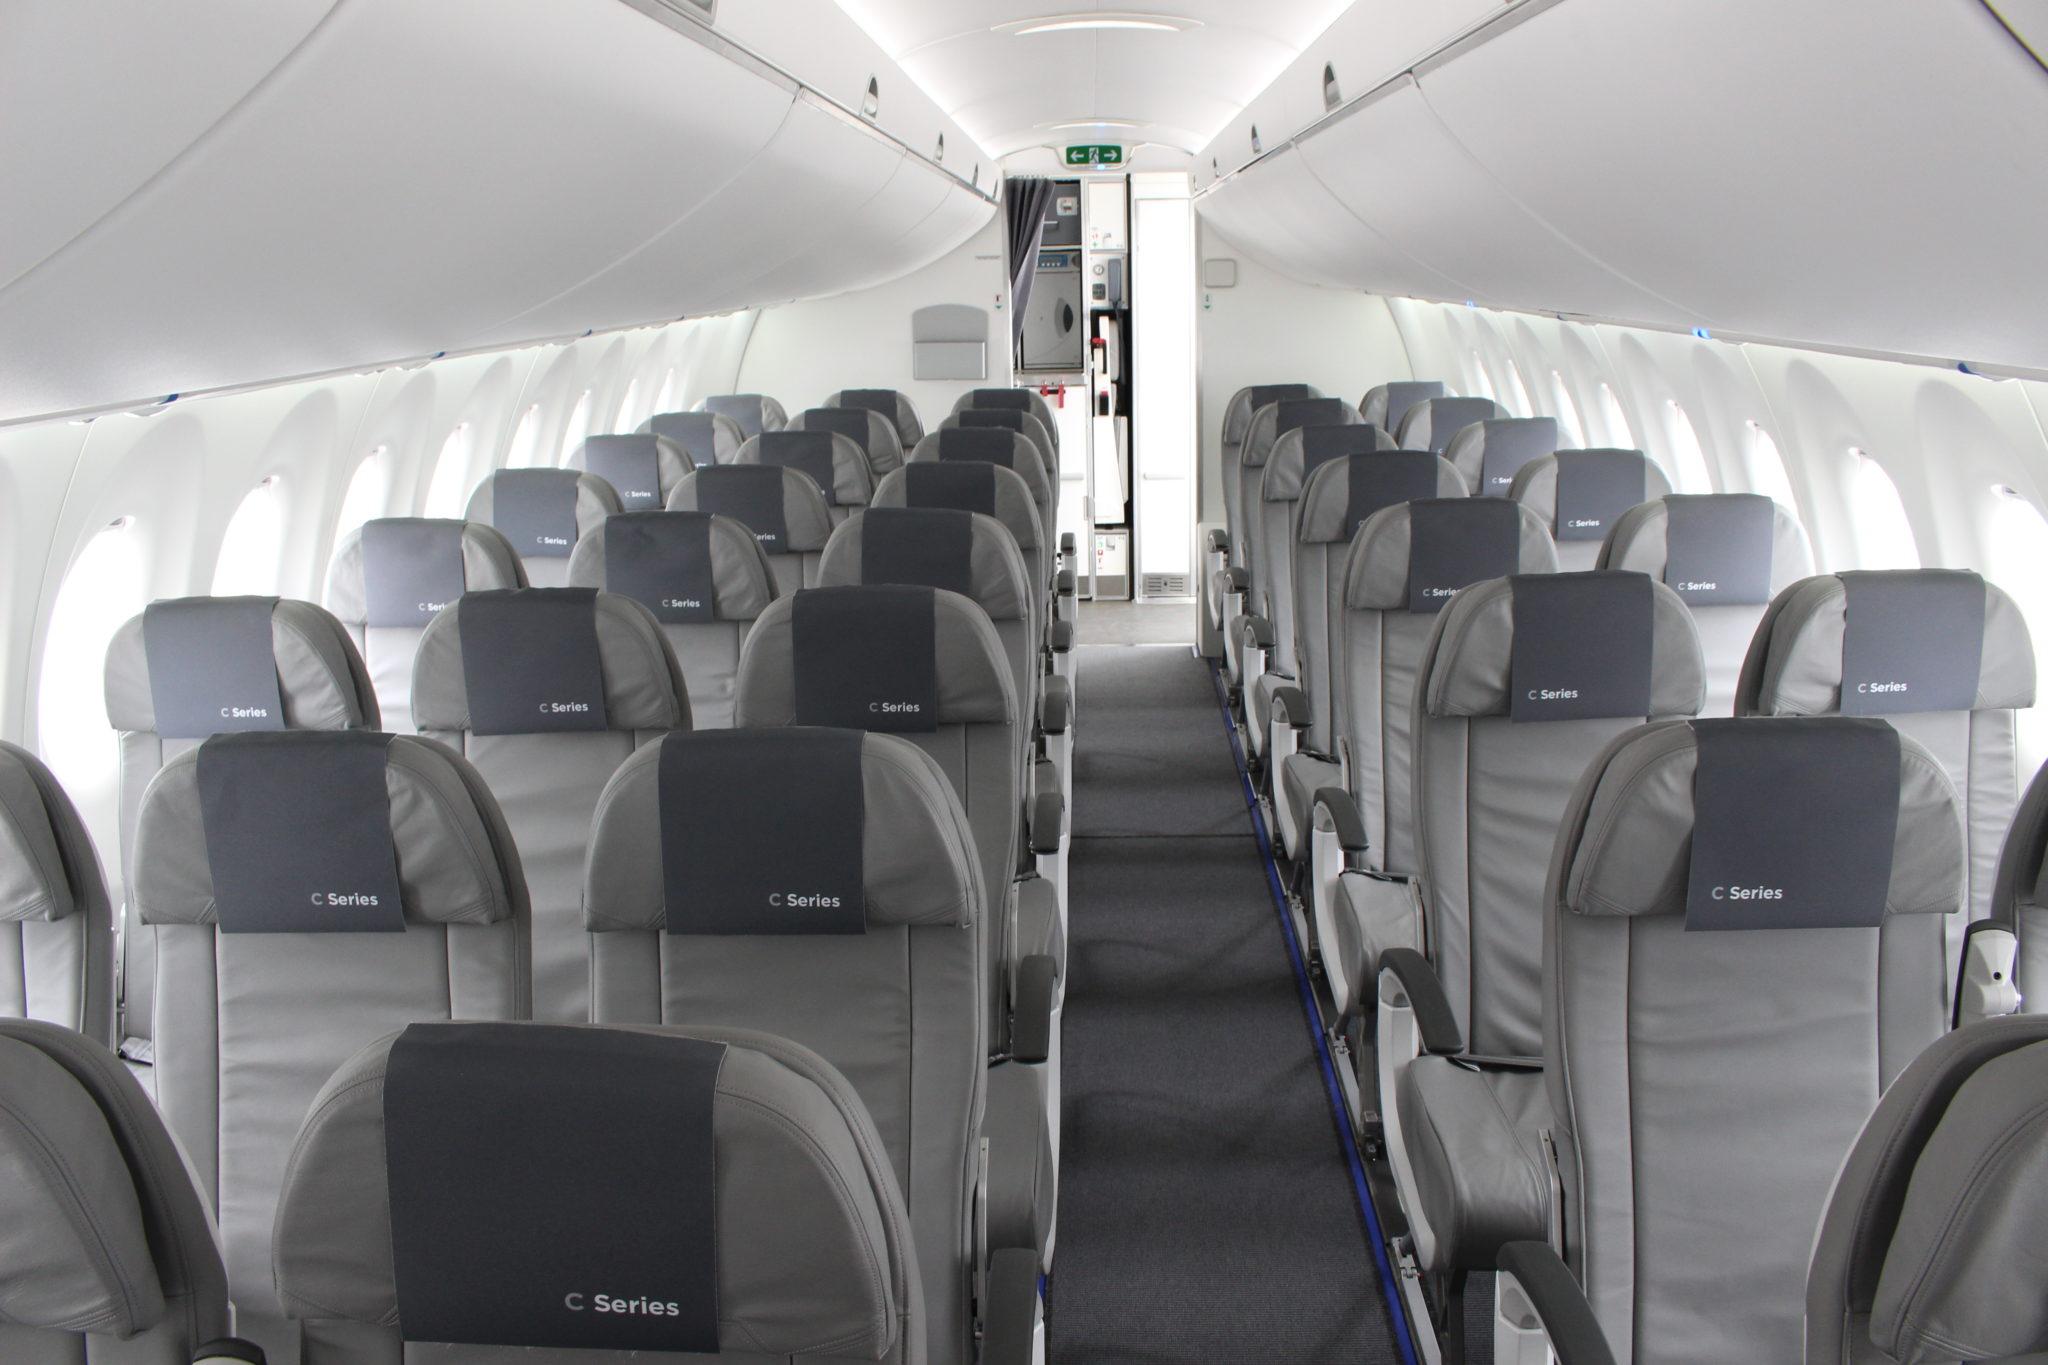 Swiss Chooses 1 2 Eurobusiness For Bombardier Cseries Runway Girlrunway Girl